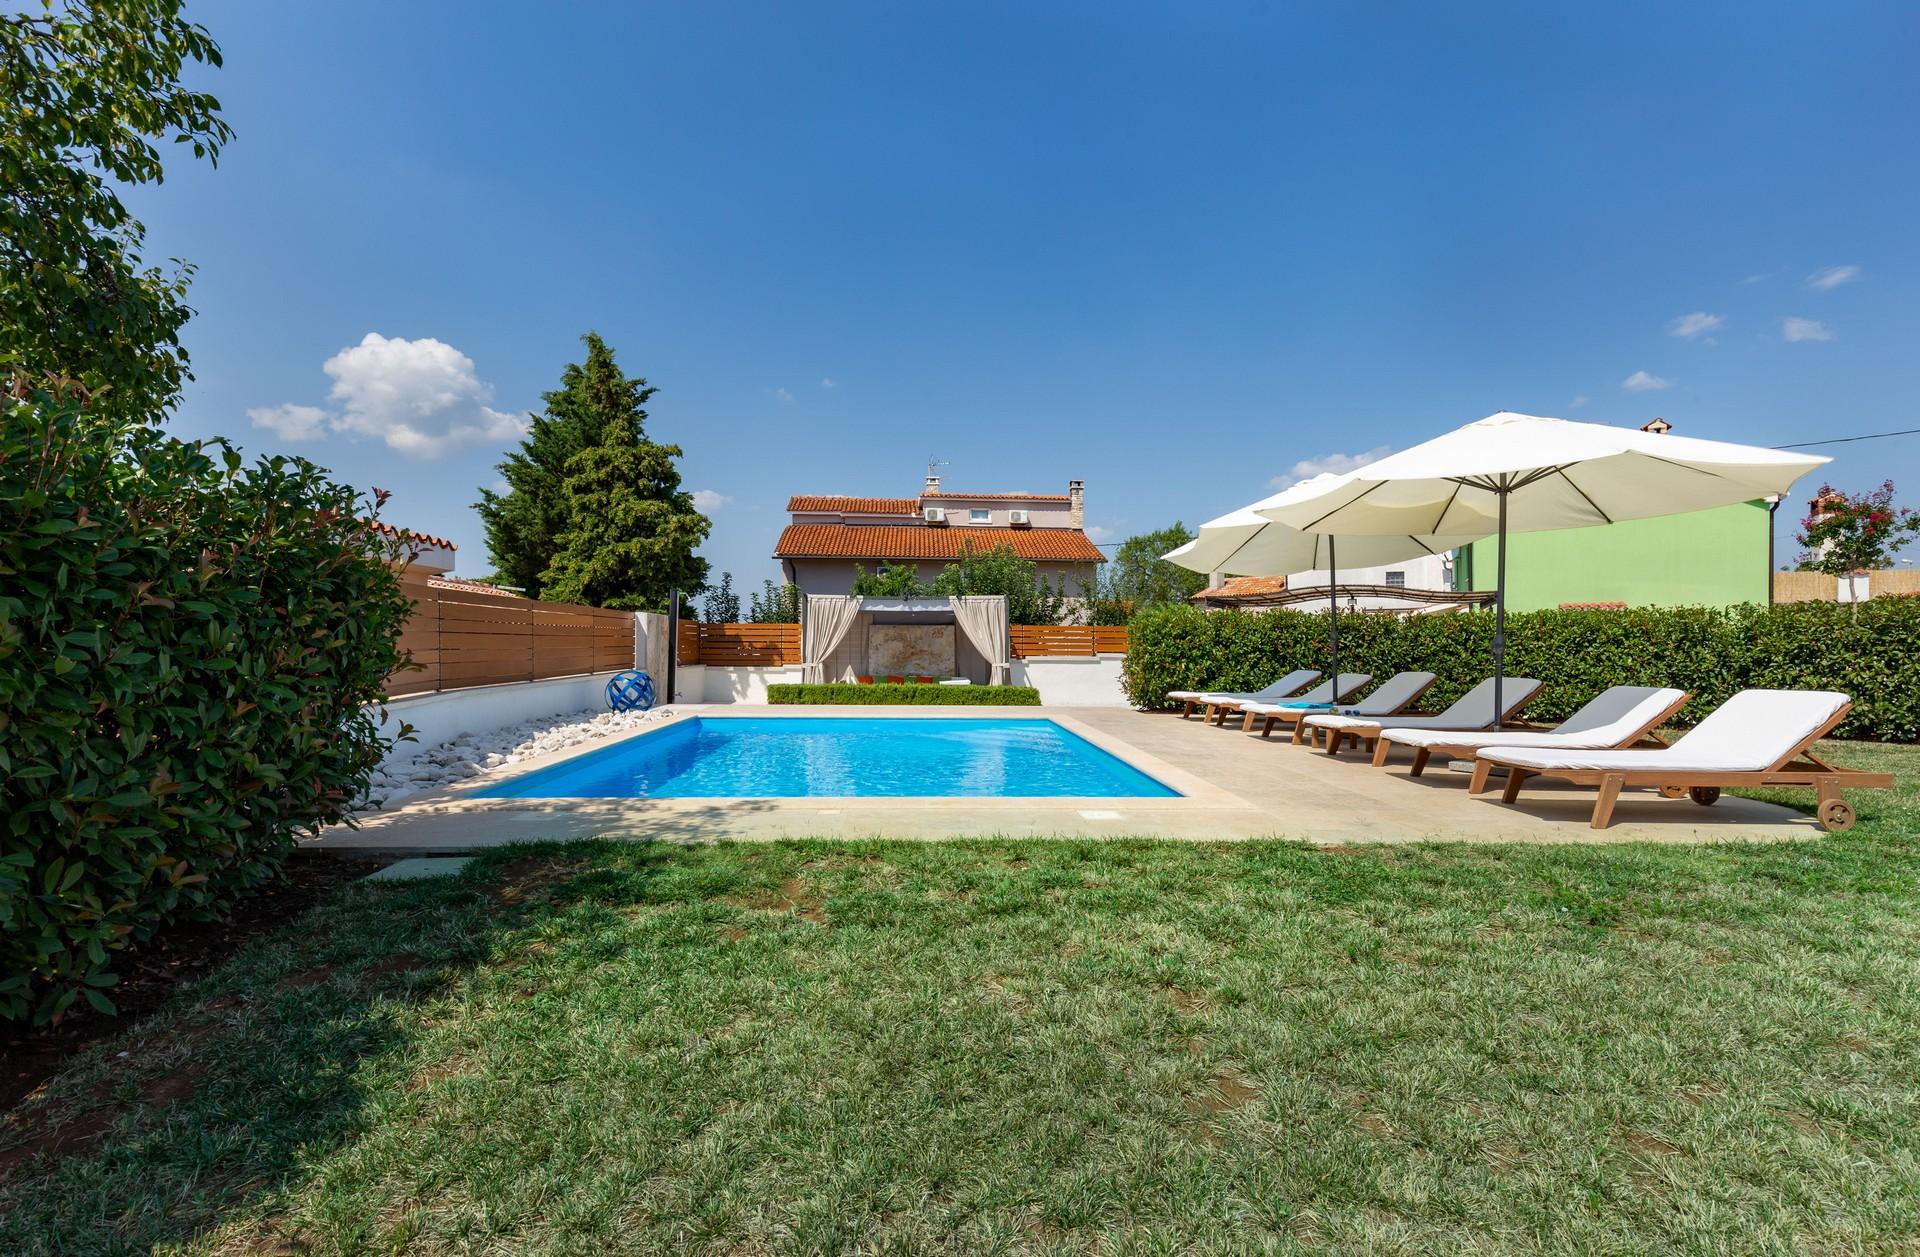 villa deal outdoors (22)